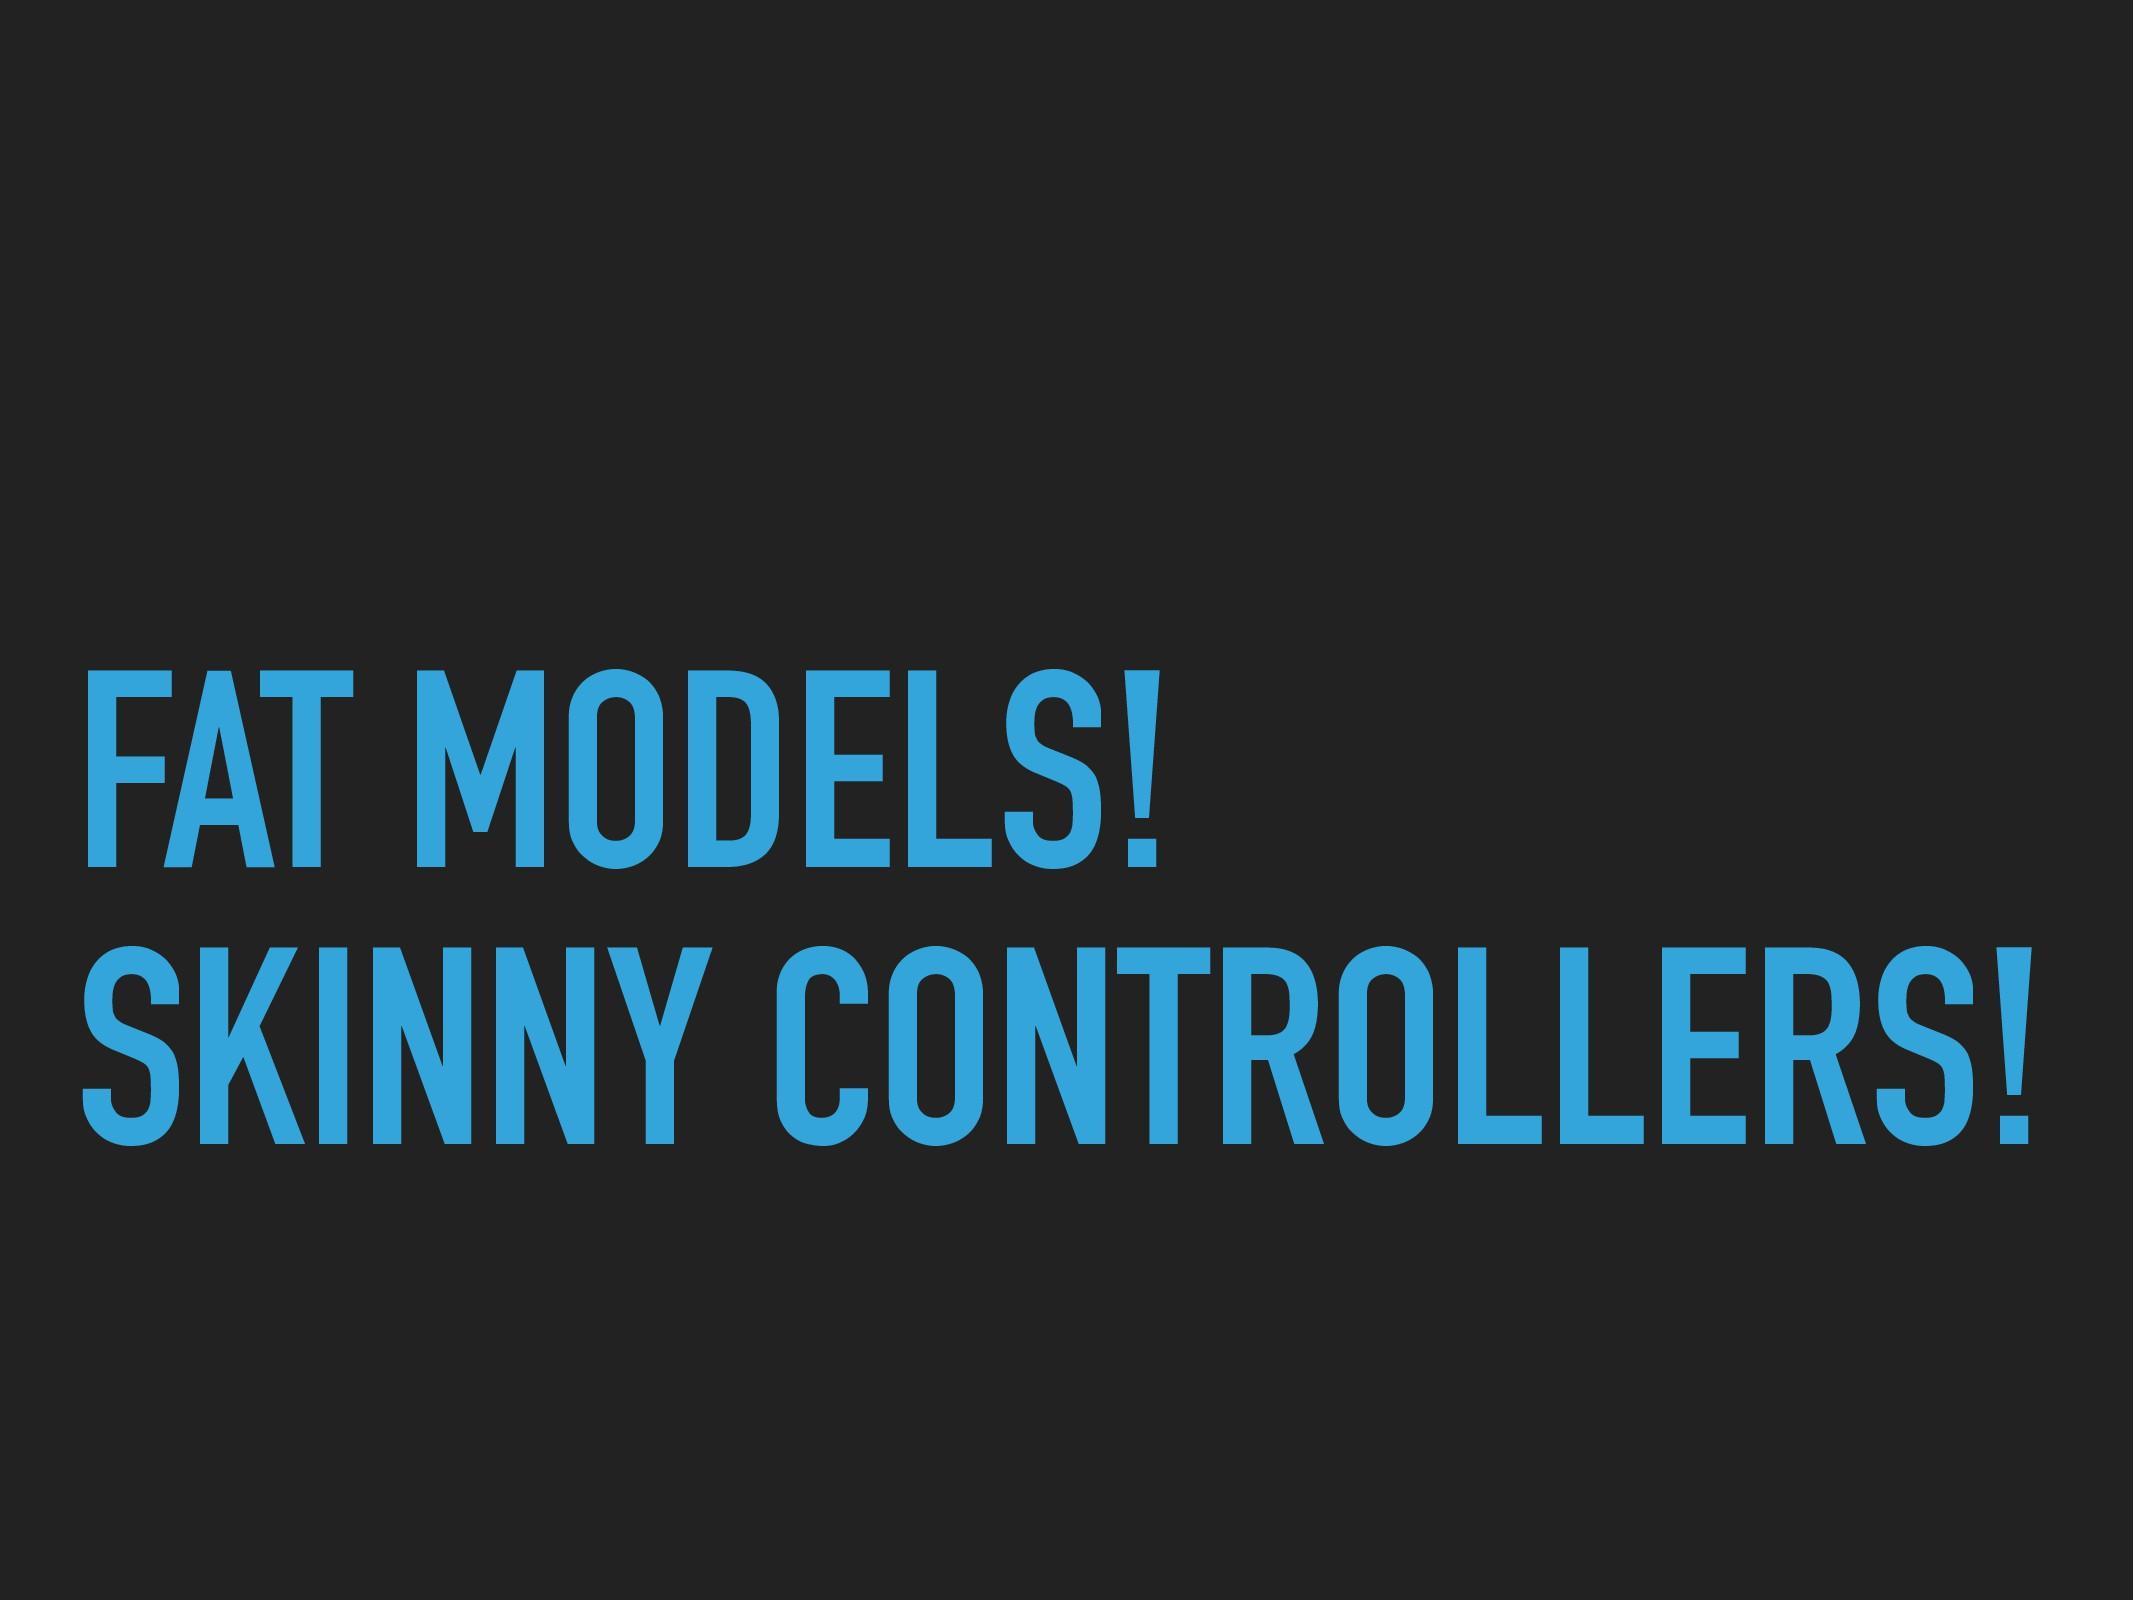 FAT MODELS! SKINNY CONTROLLERS!